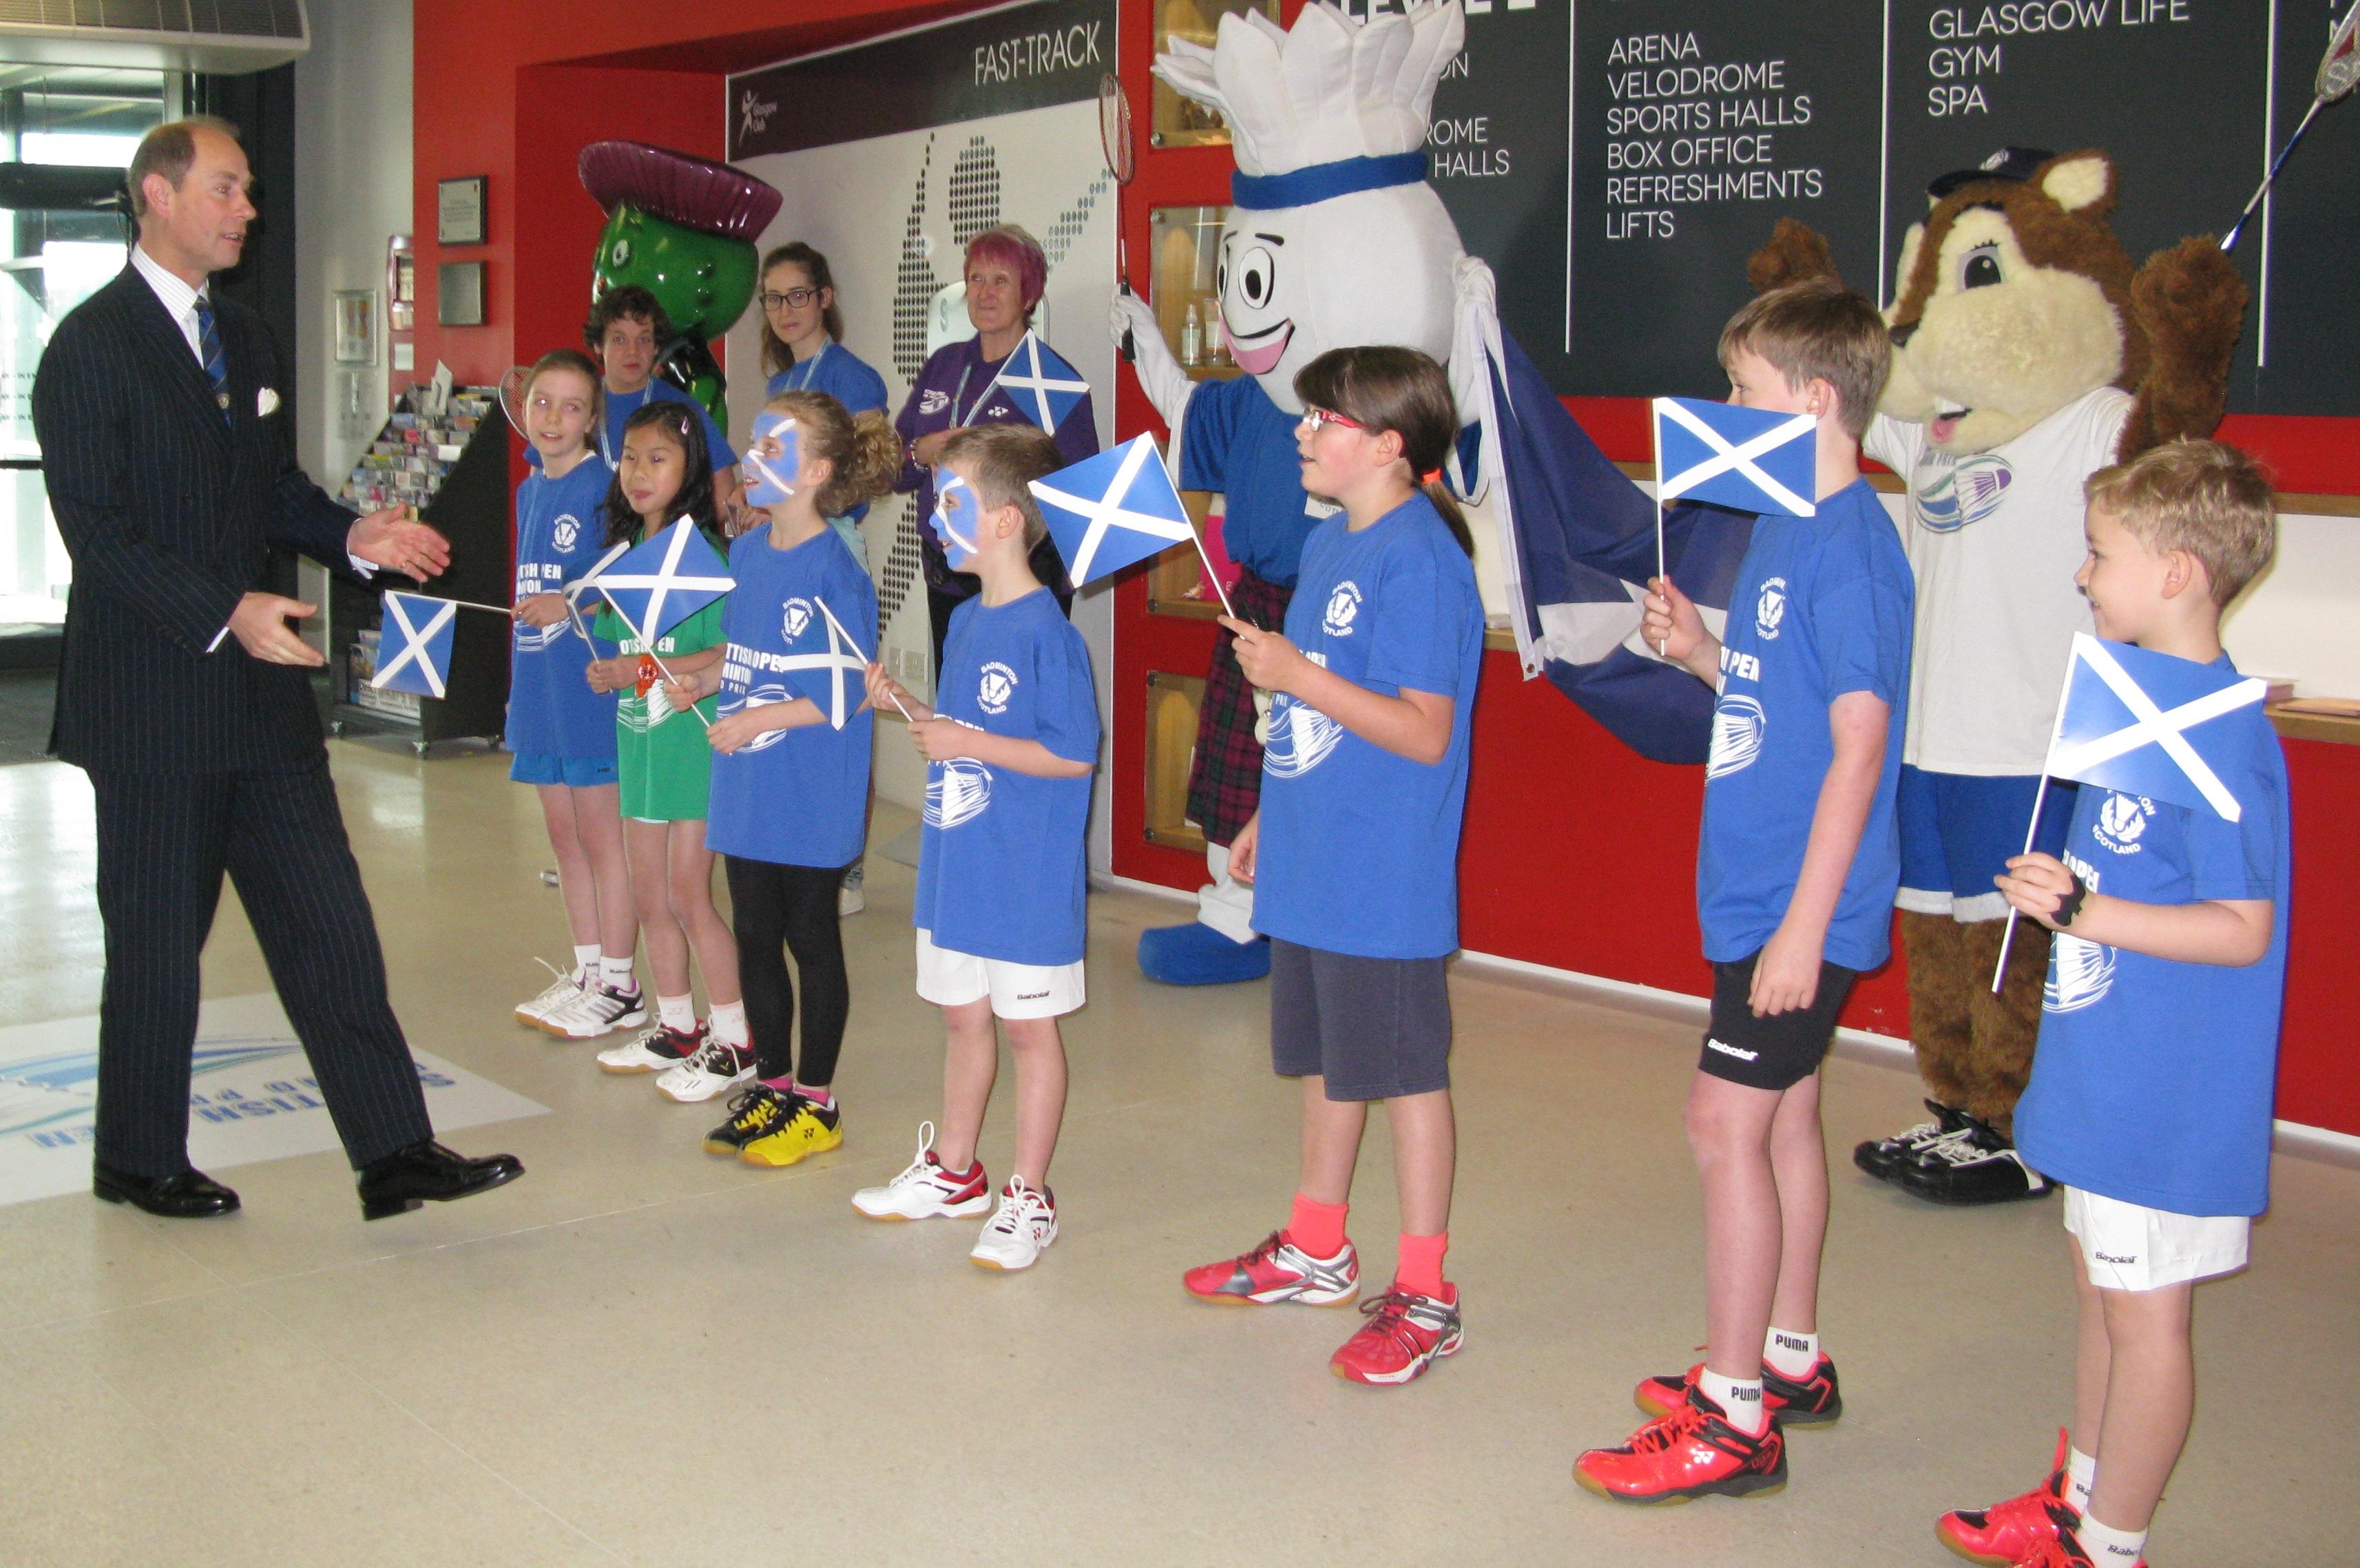 scotstoun badminton club gallery